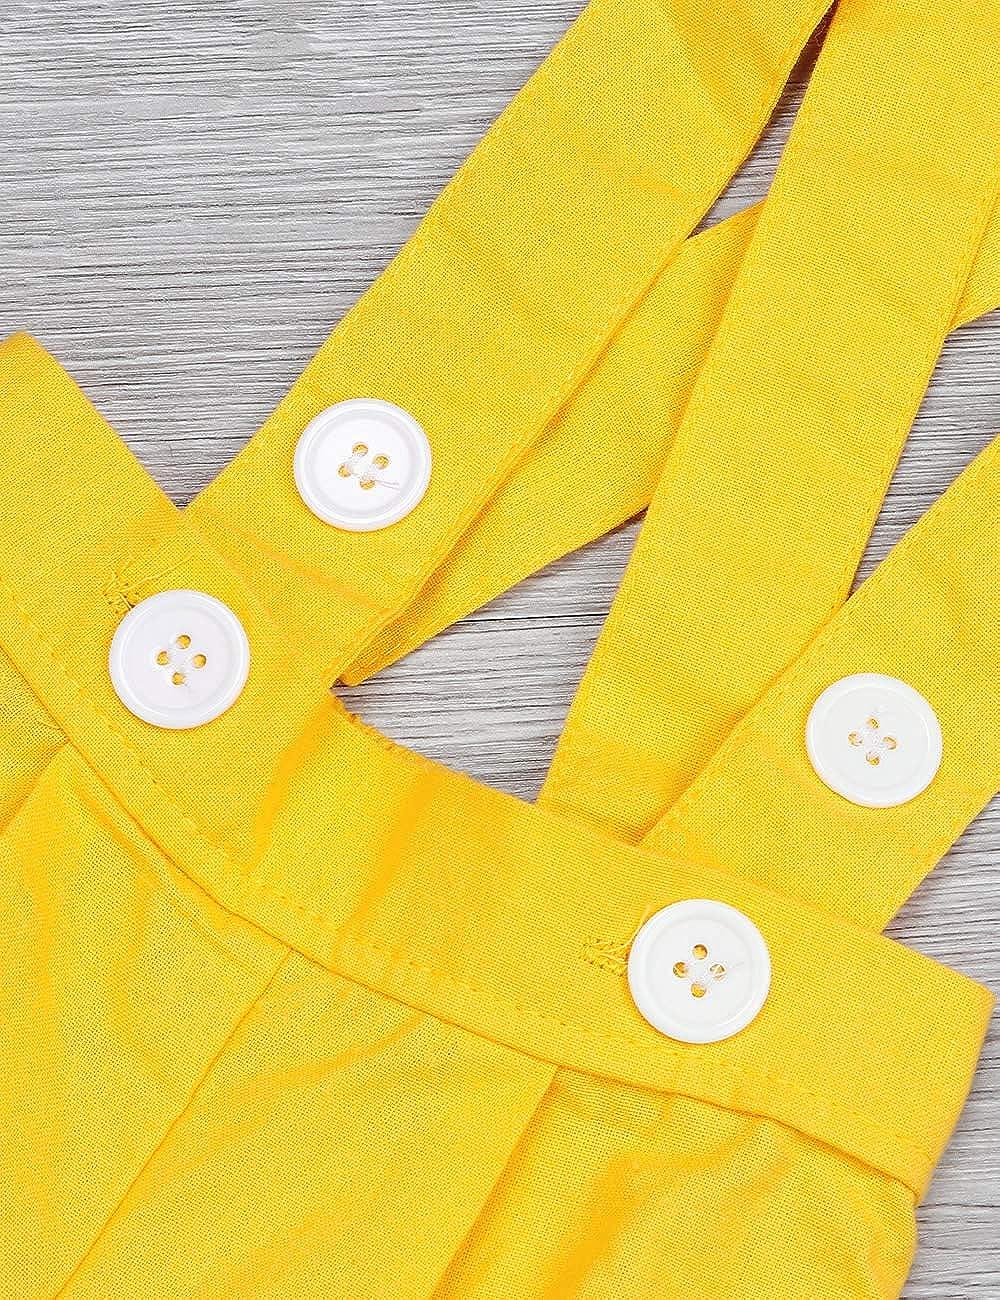 Toddler Baby Girl Clothes Ruffles Short Sleeve Bowknot Shirt+Overall Skirt with Headbands 3Pcs Outfits Set School Uniform